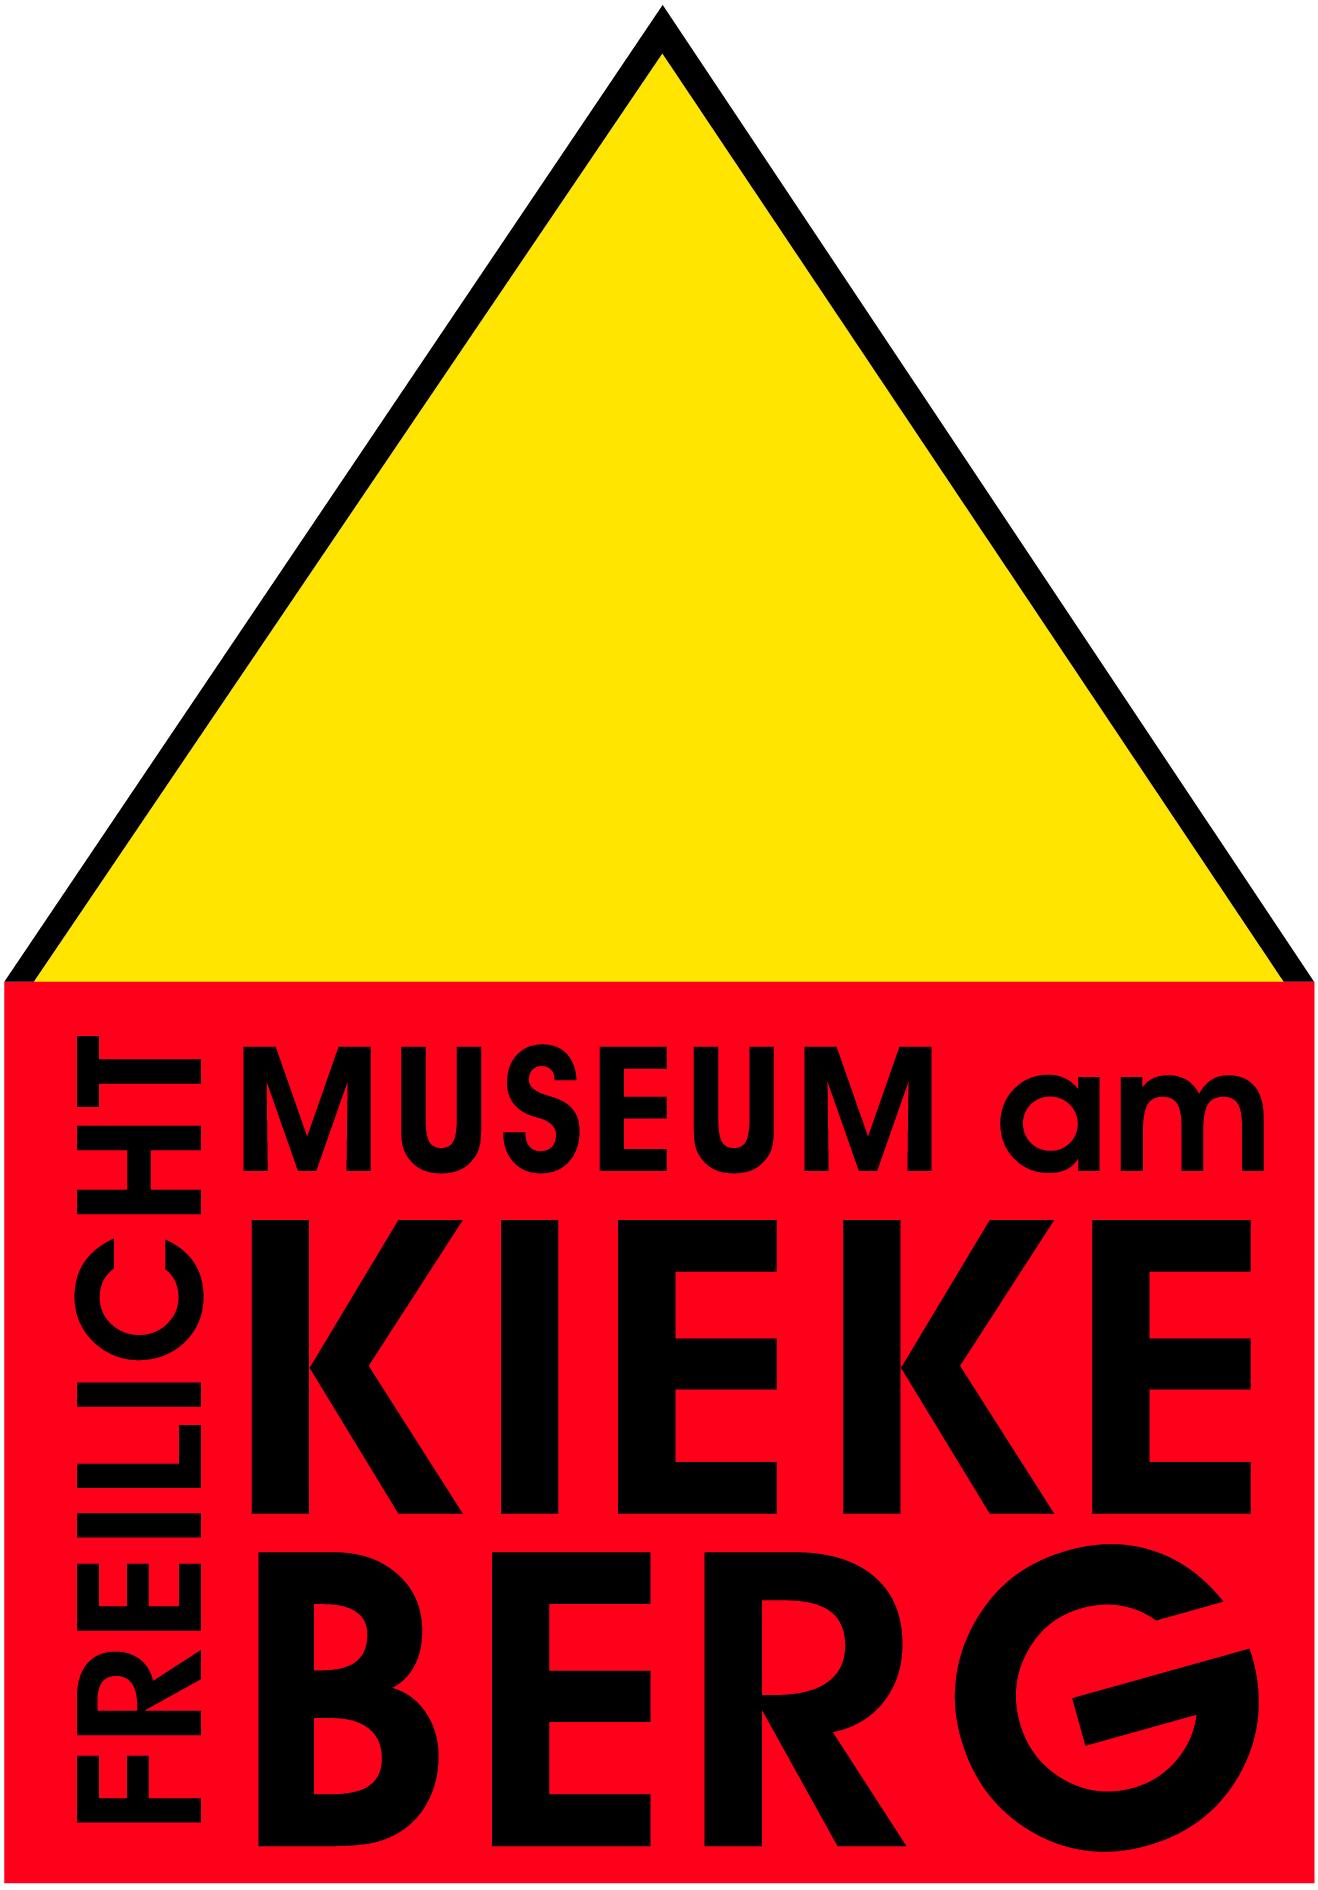 Freikarten September - Freilichtmuseum am Kiekeberg